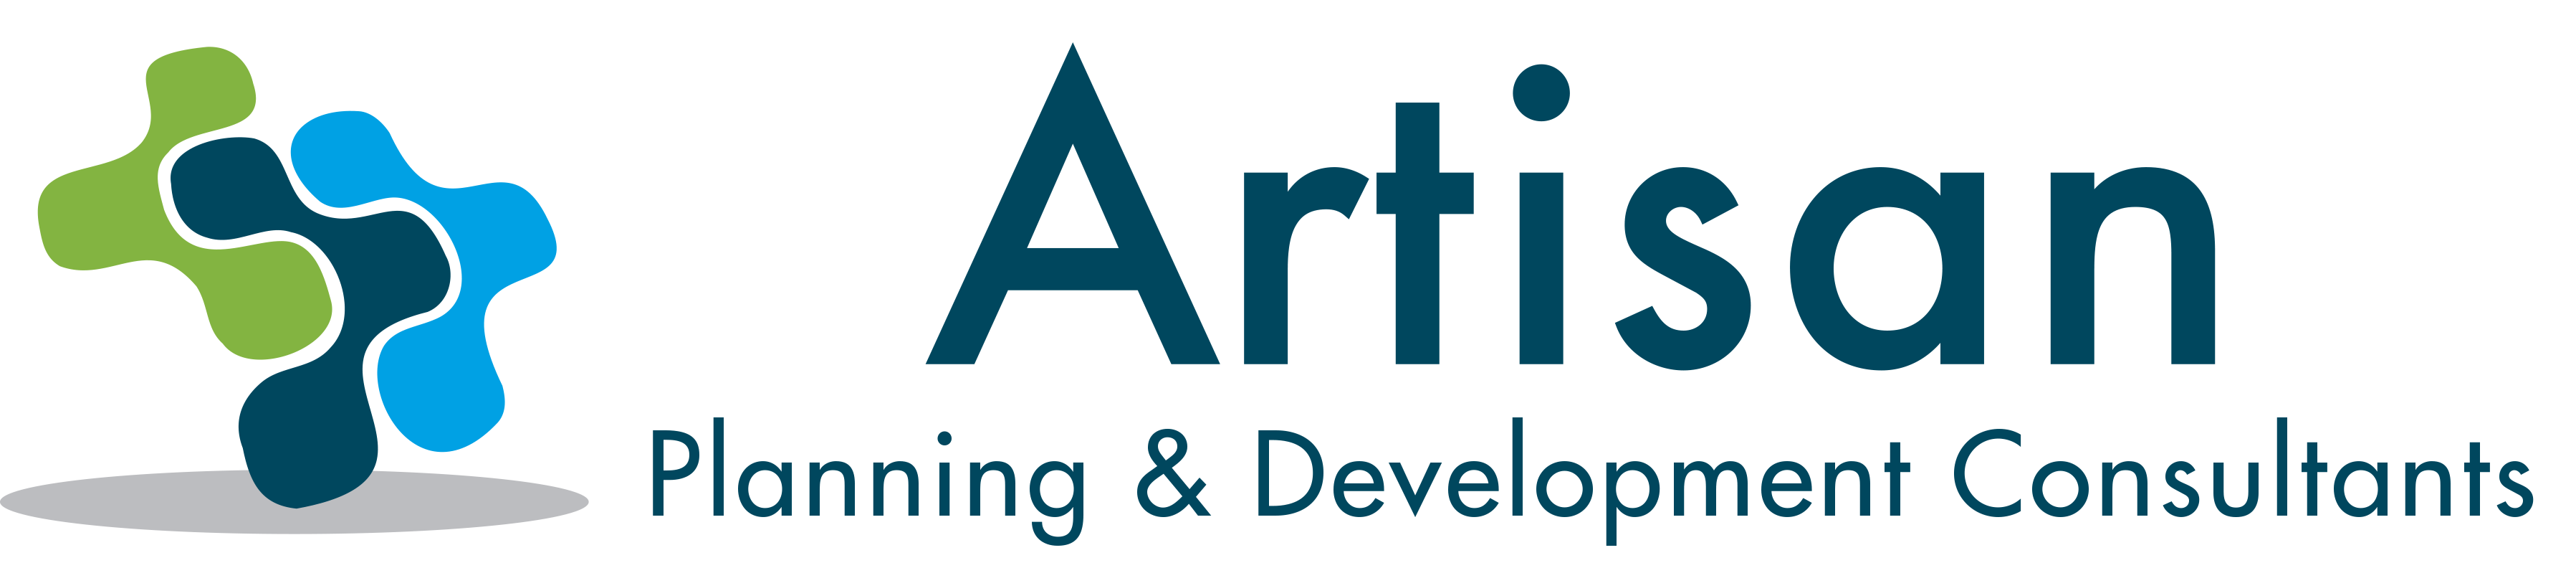 Artisan Planning & Development Consultants